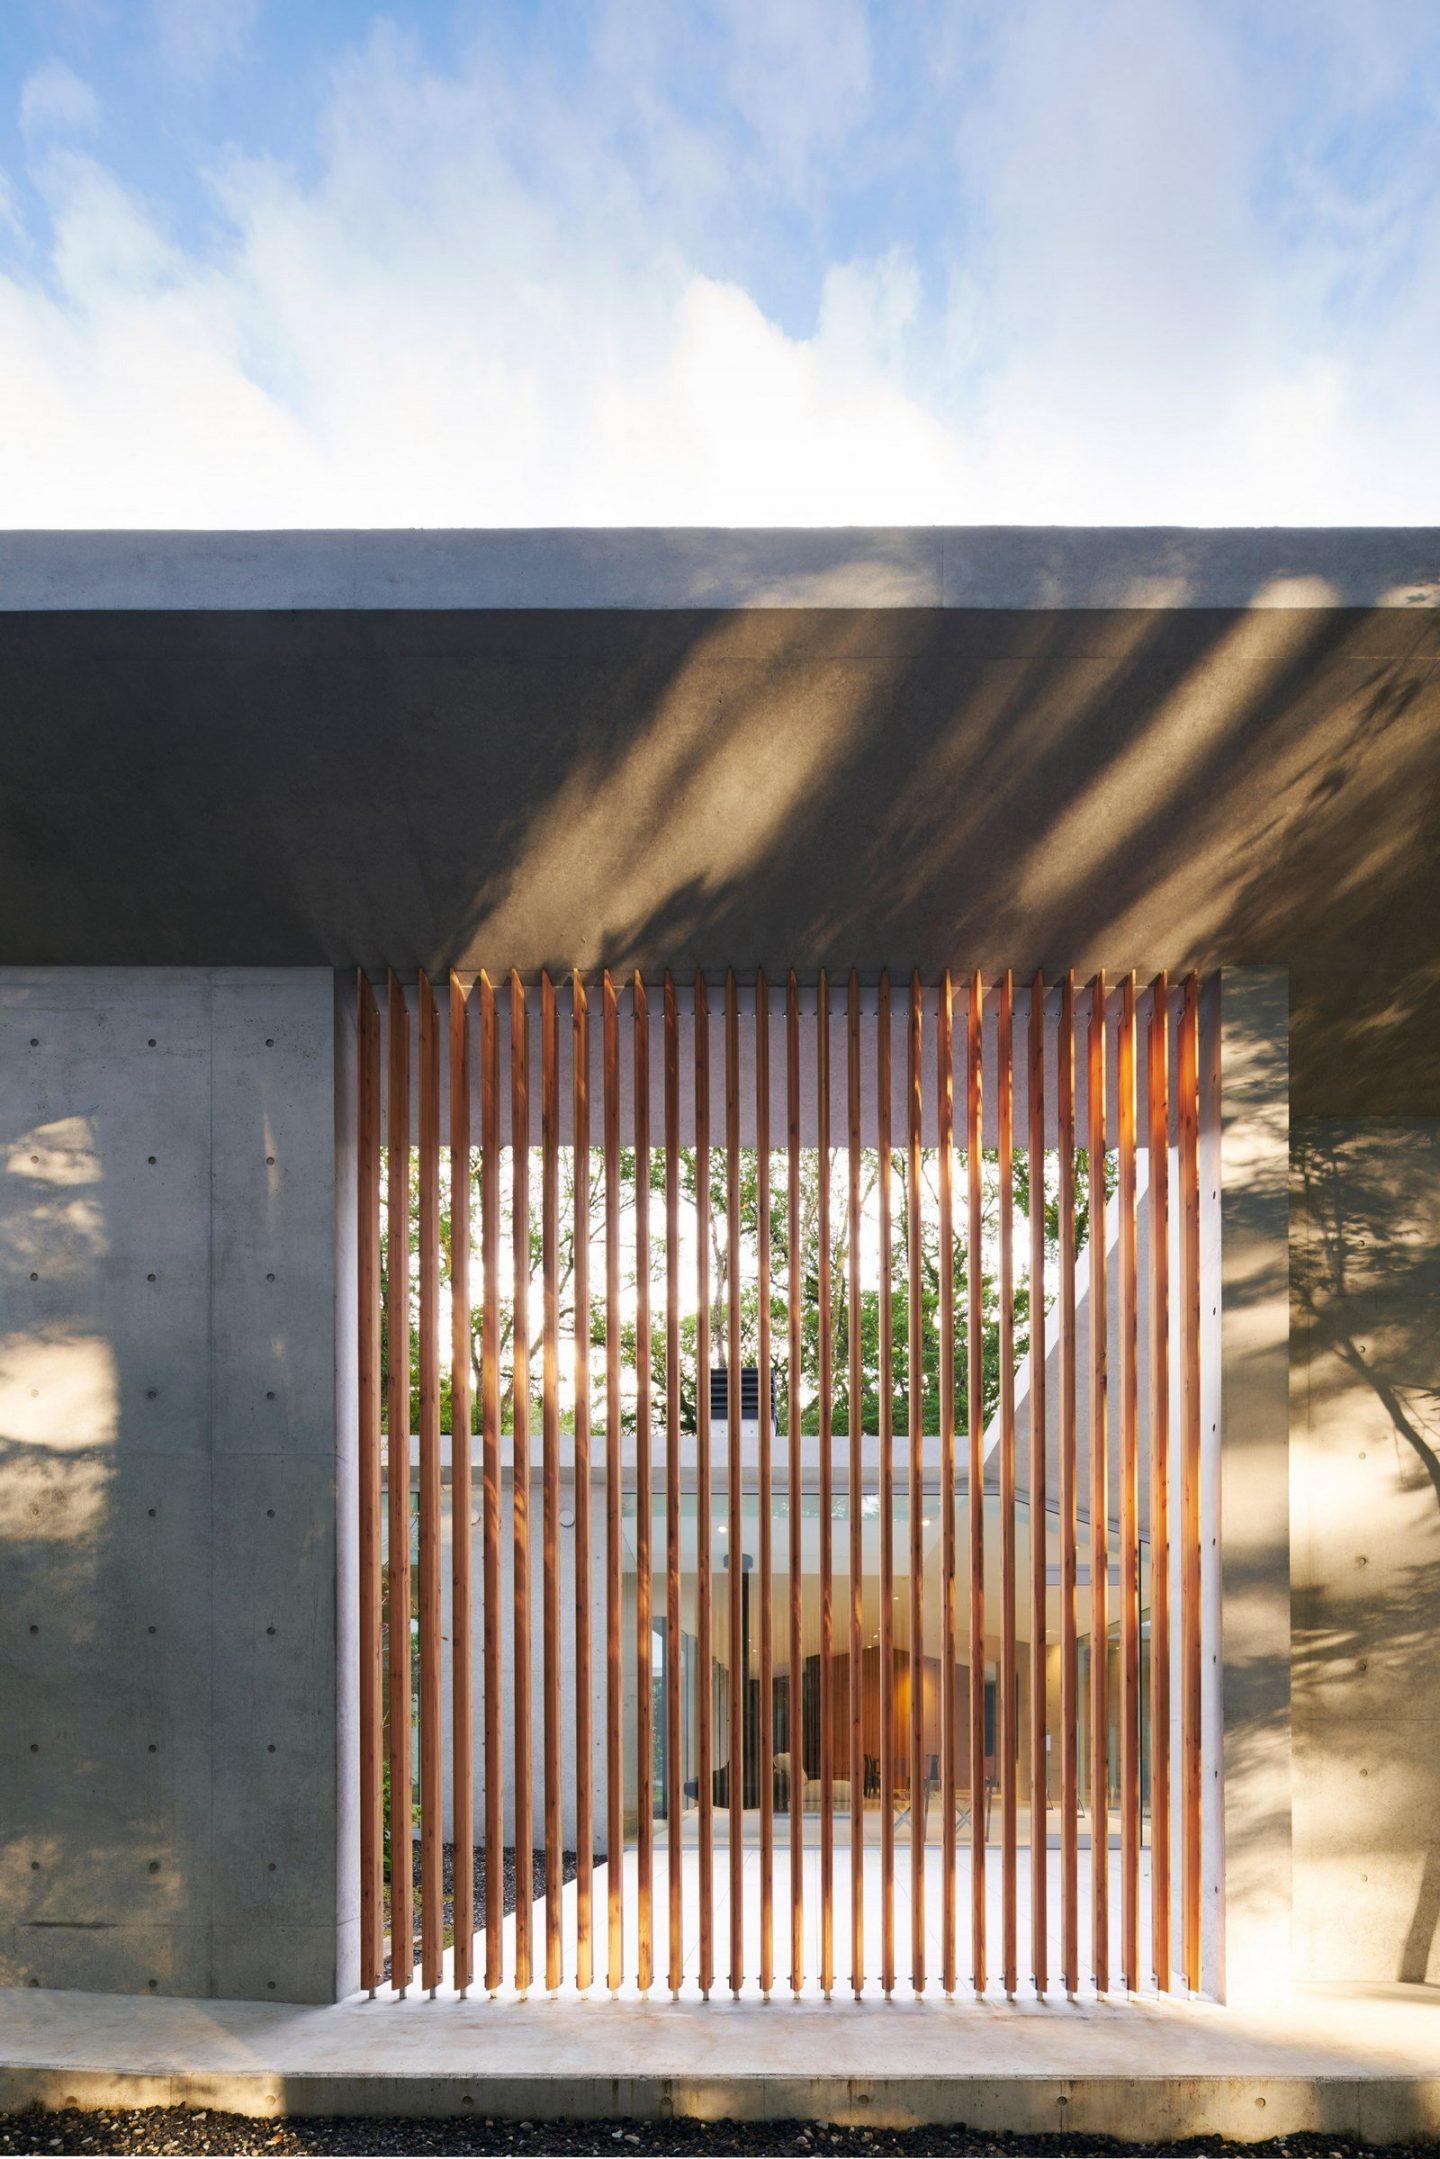 Matsubara_Ariyama_Architecture (6)